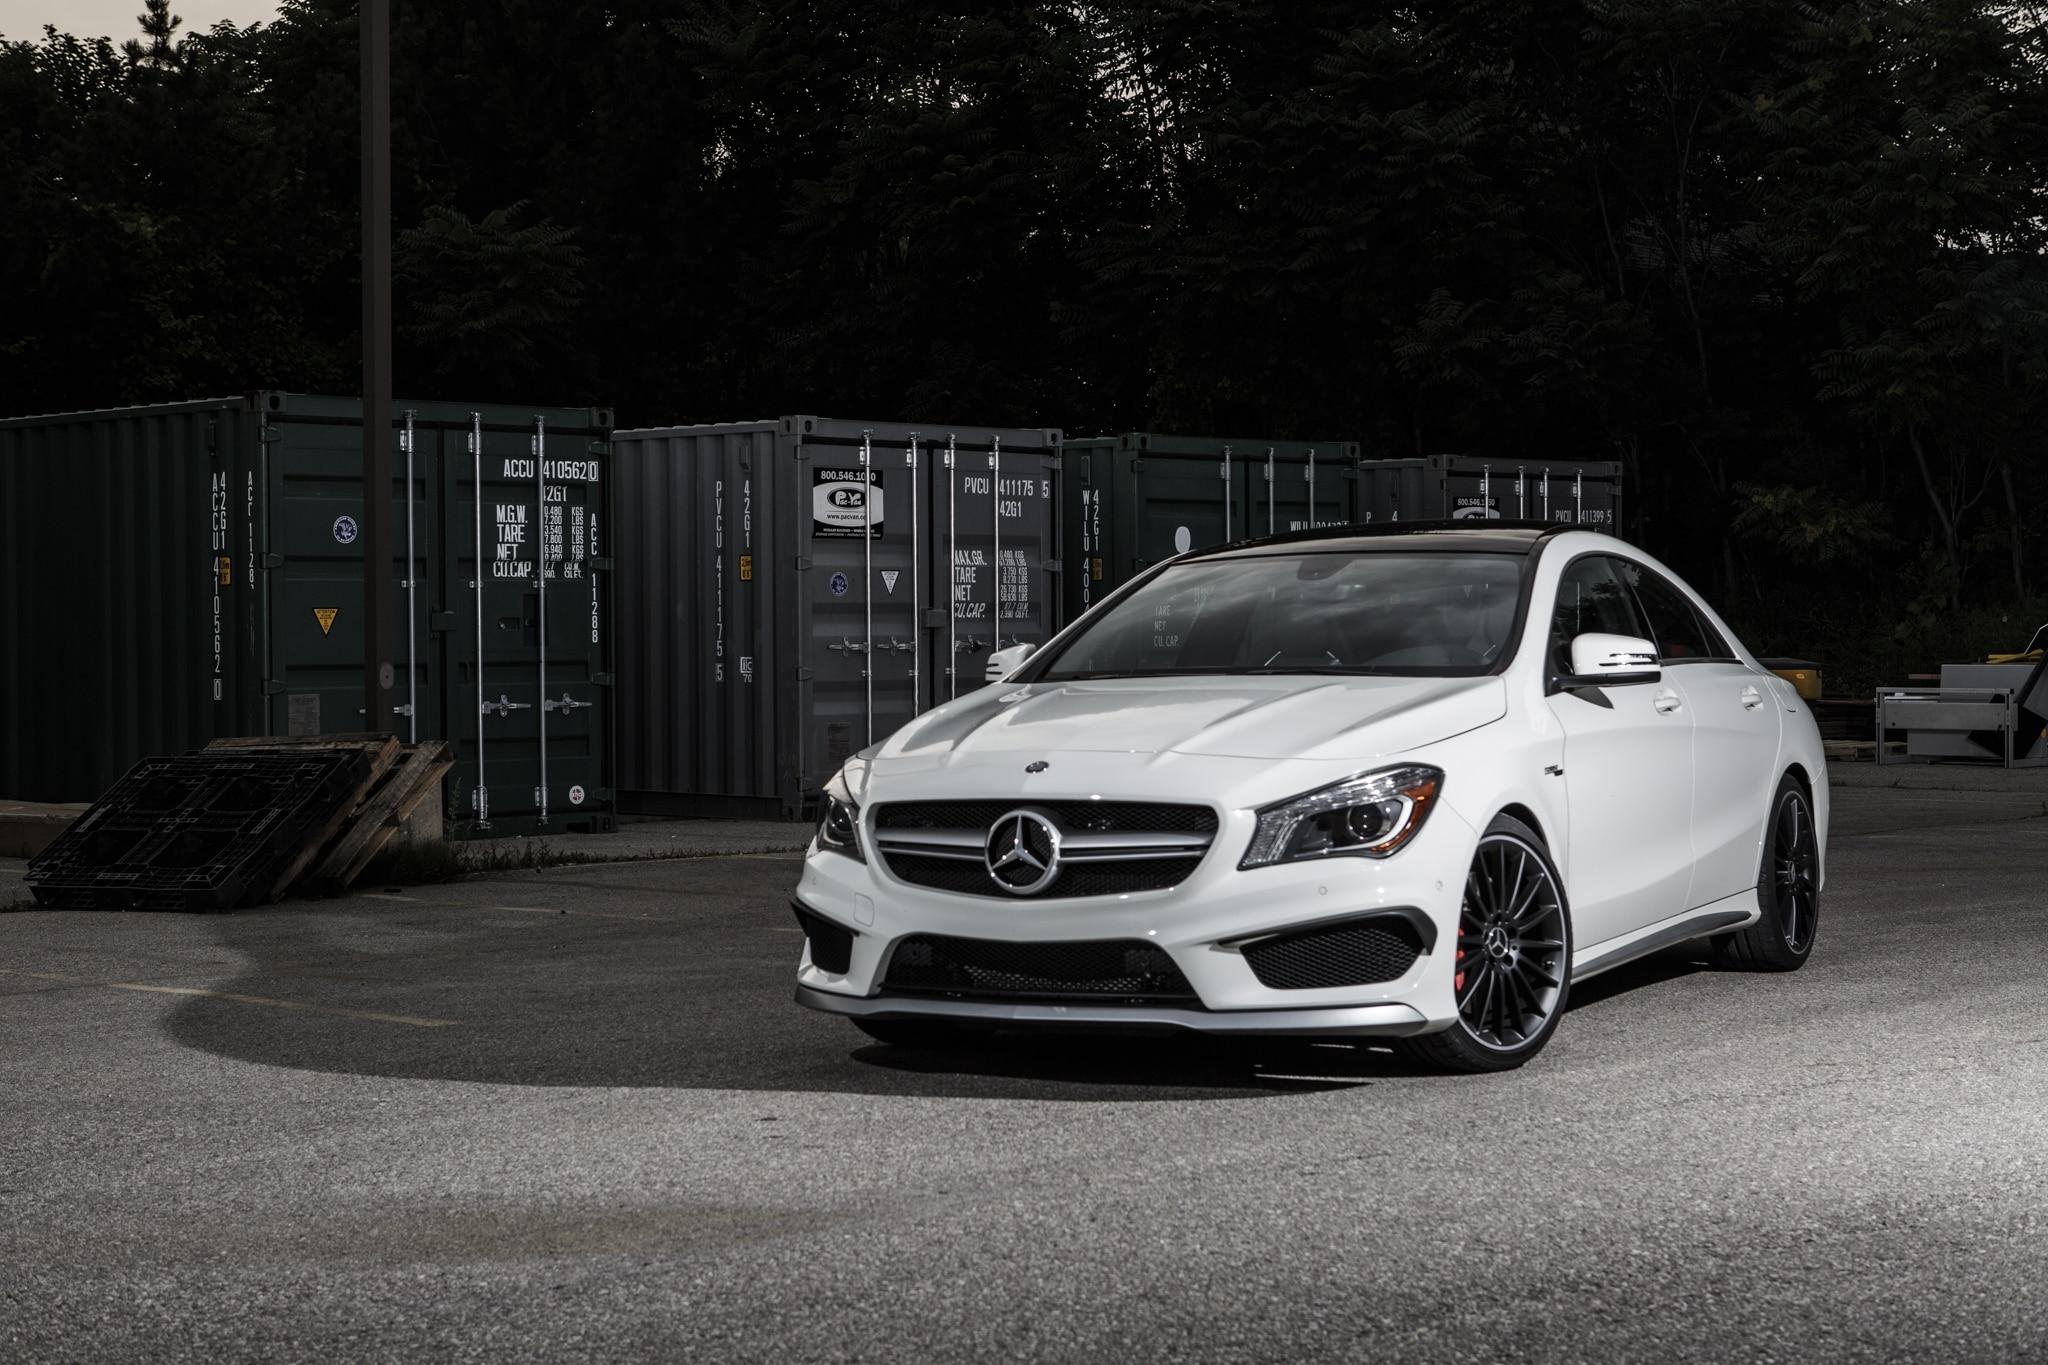 2016 mercedes amg cla45 gla45 gain 20 hp 18 lb ft for Mercedes benz cla45 amg 0 60